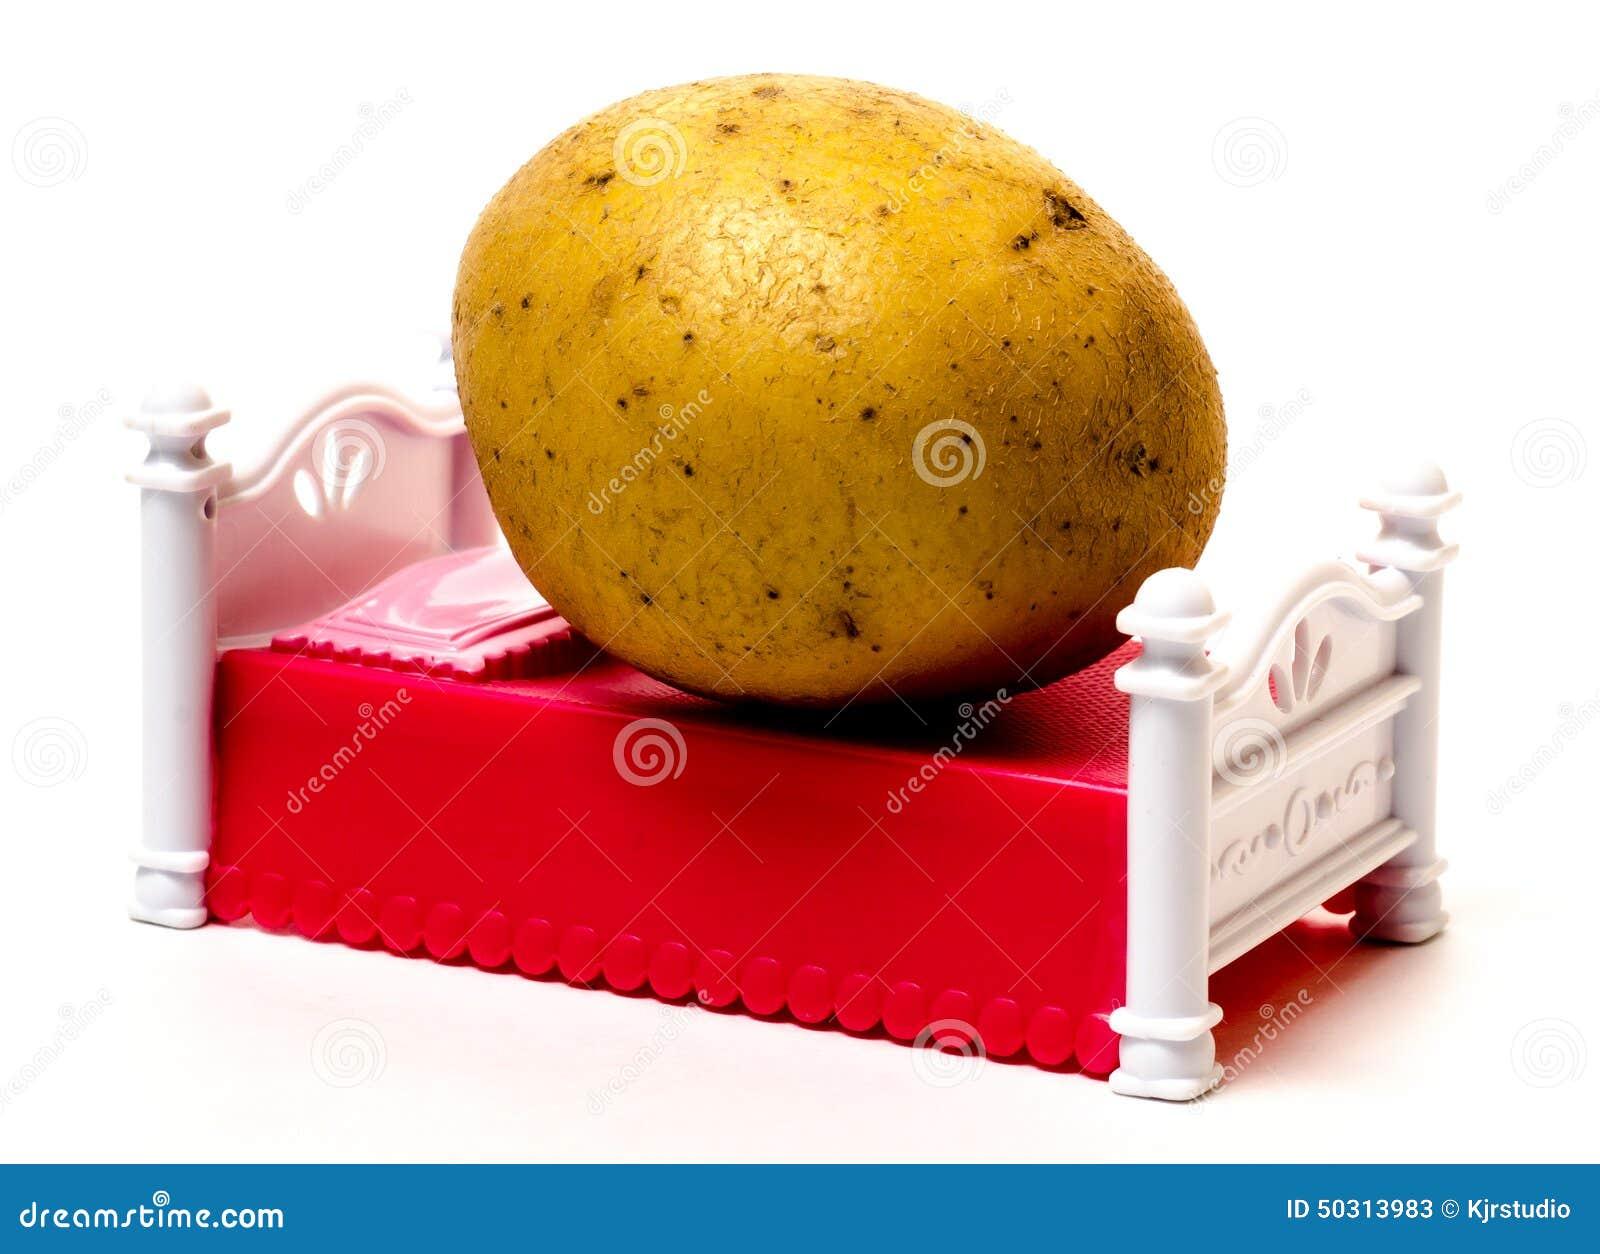 Couch Potato Royalty Free Illustration Cartoondealer Com